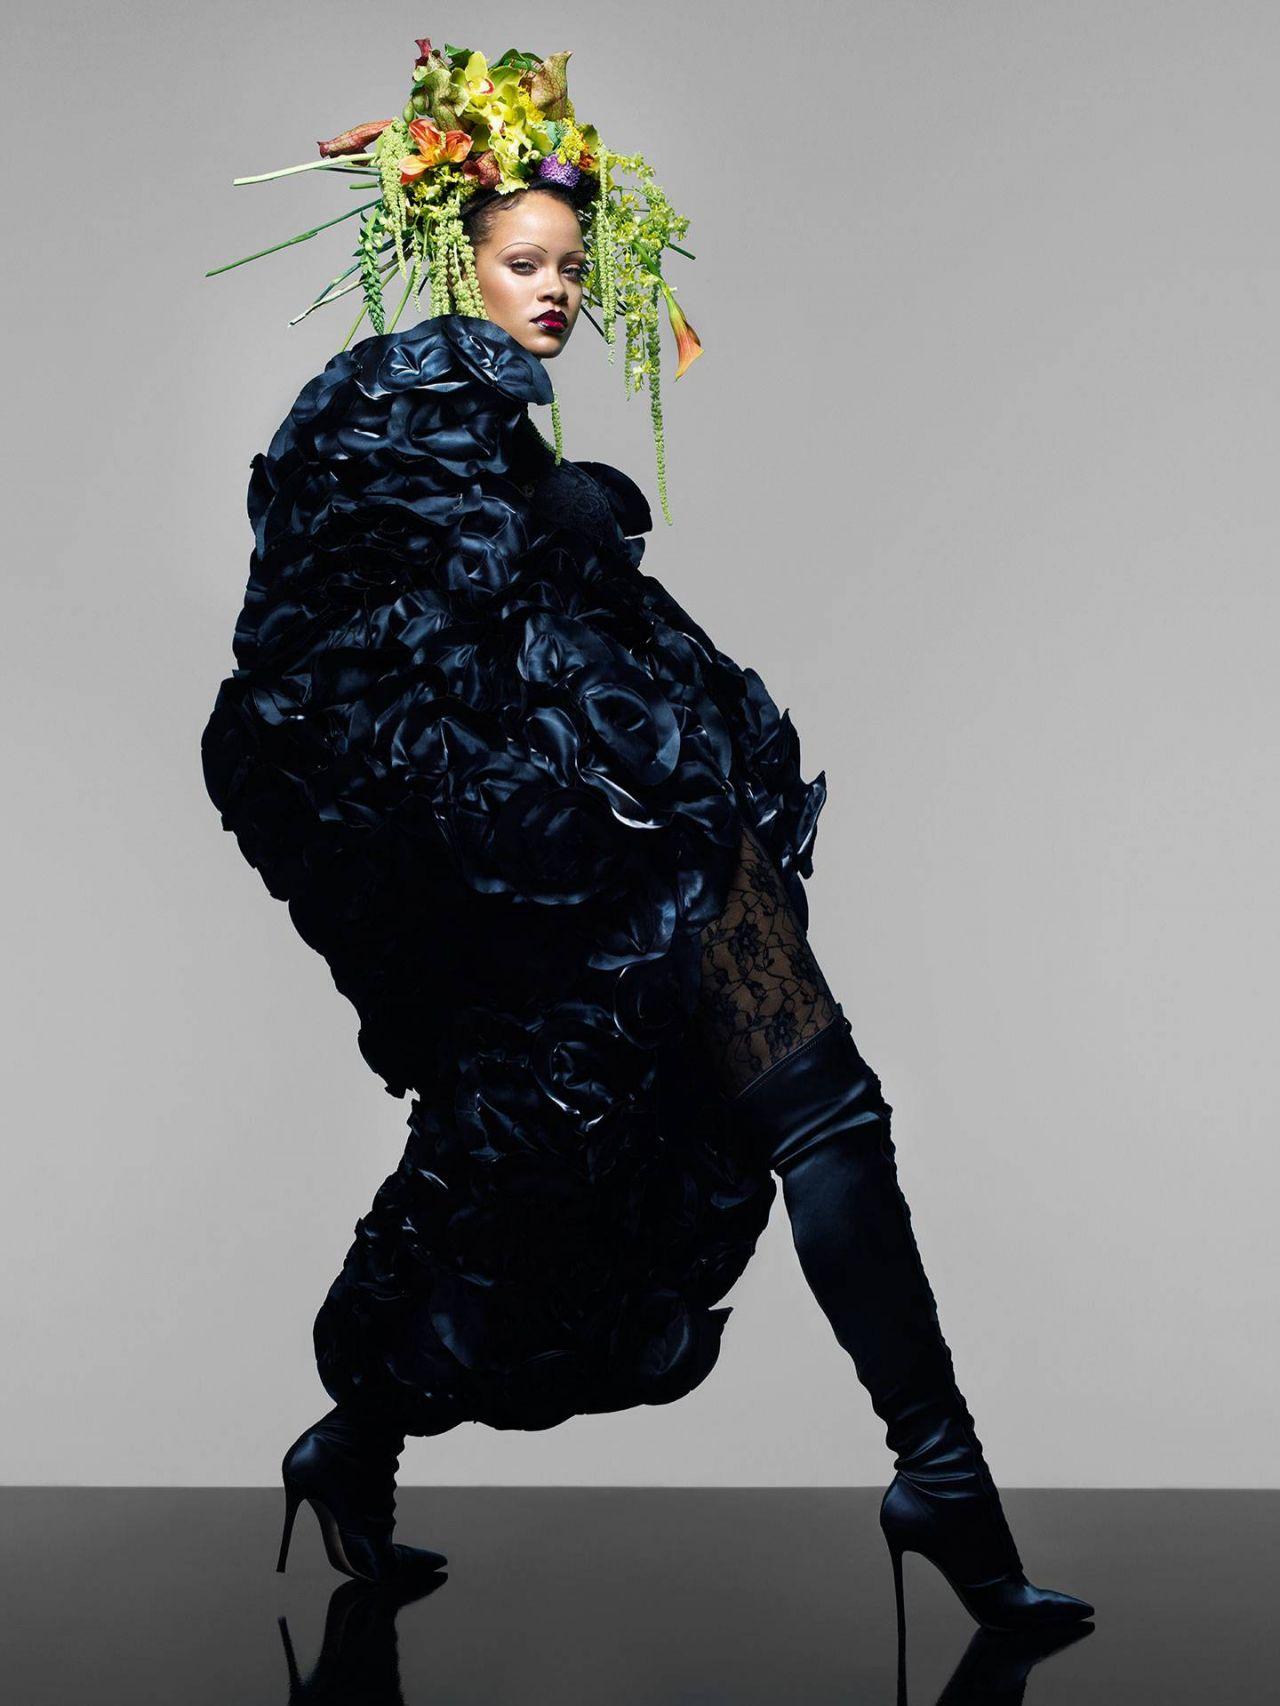 Vogue The Top Selling Fashion Magazine: Vogue UK September 2018 Photos